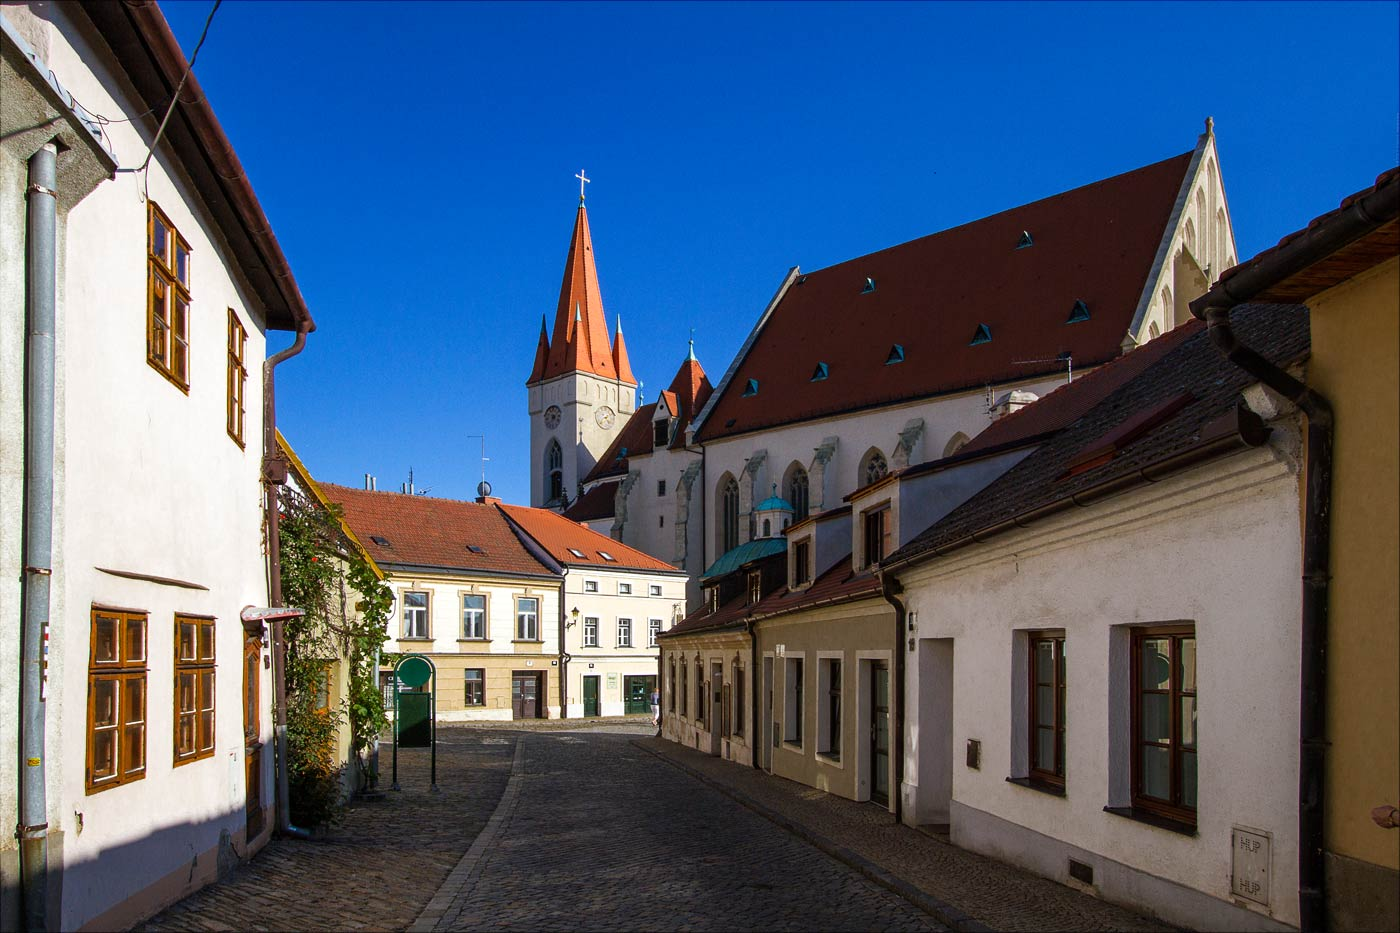 Старая улочка в центре Зноймо